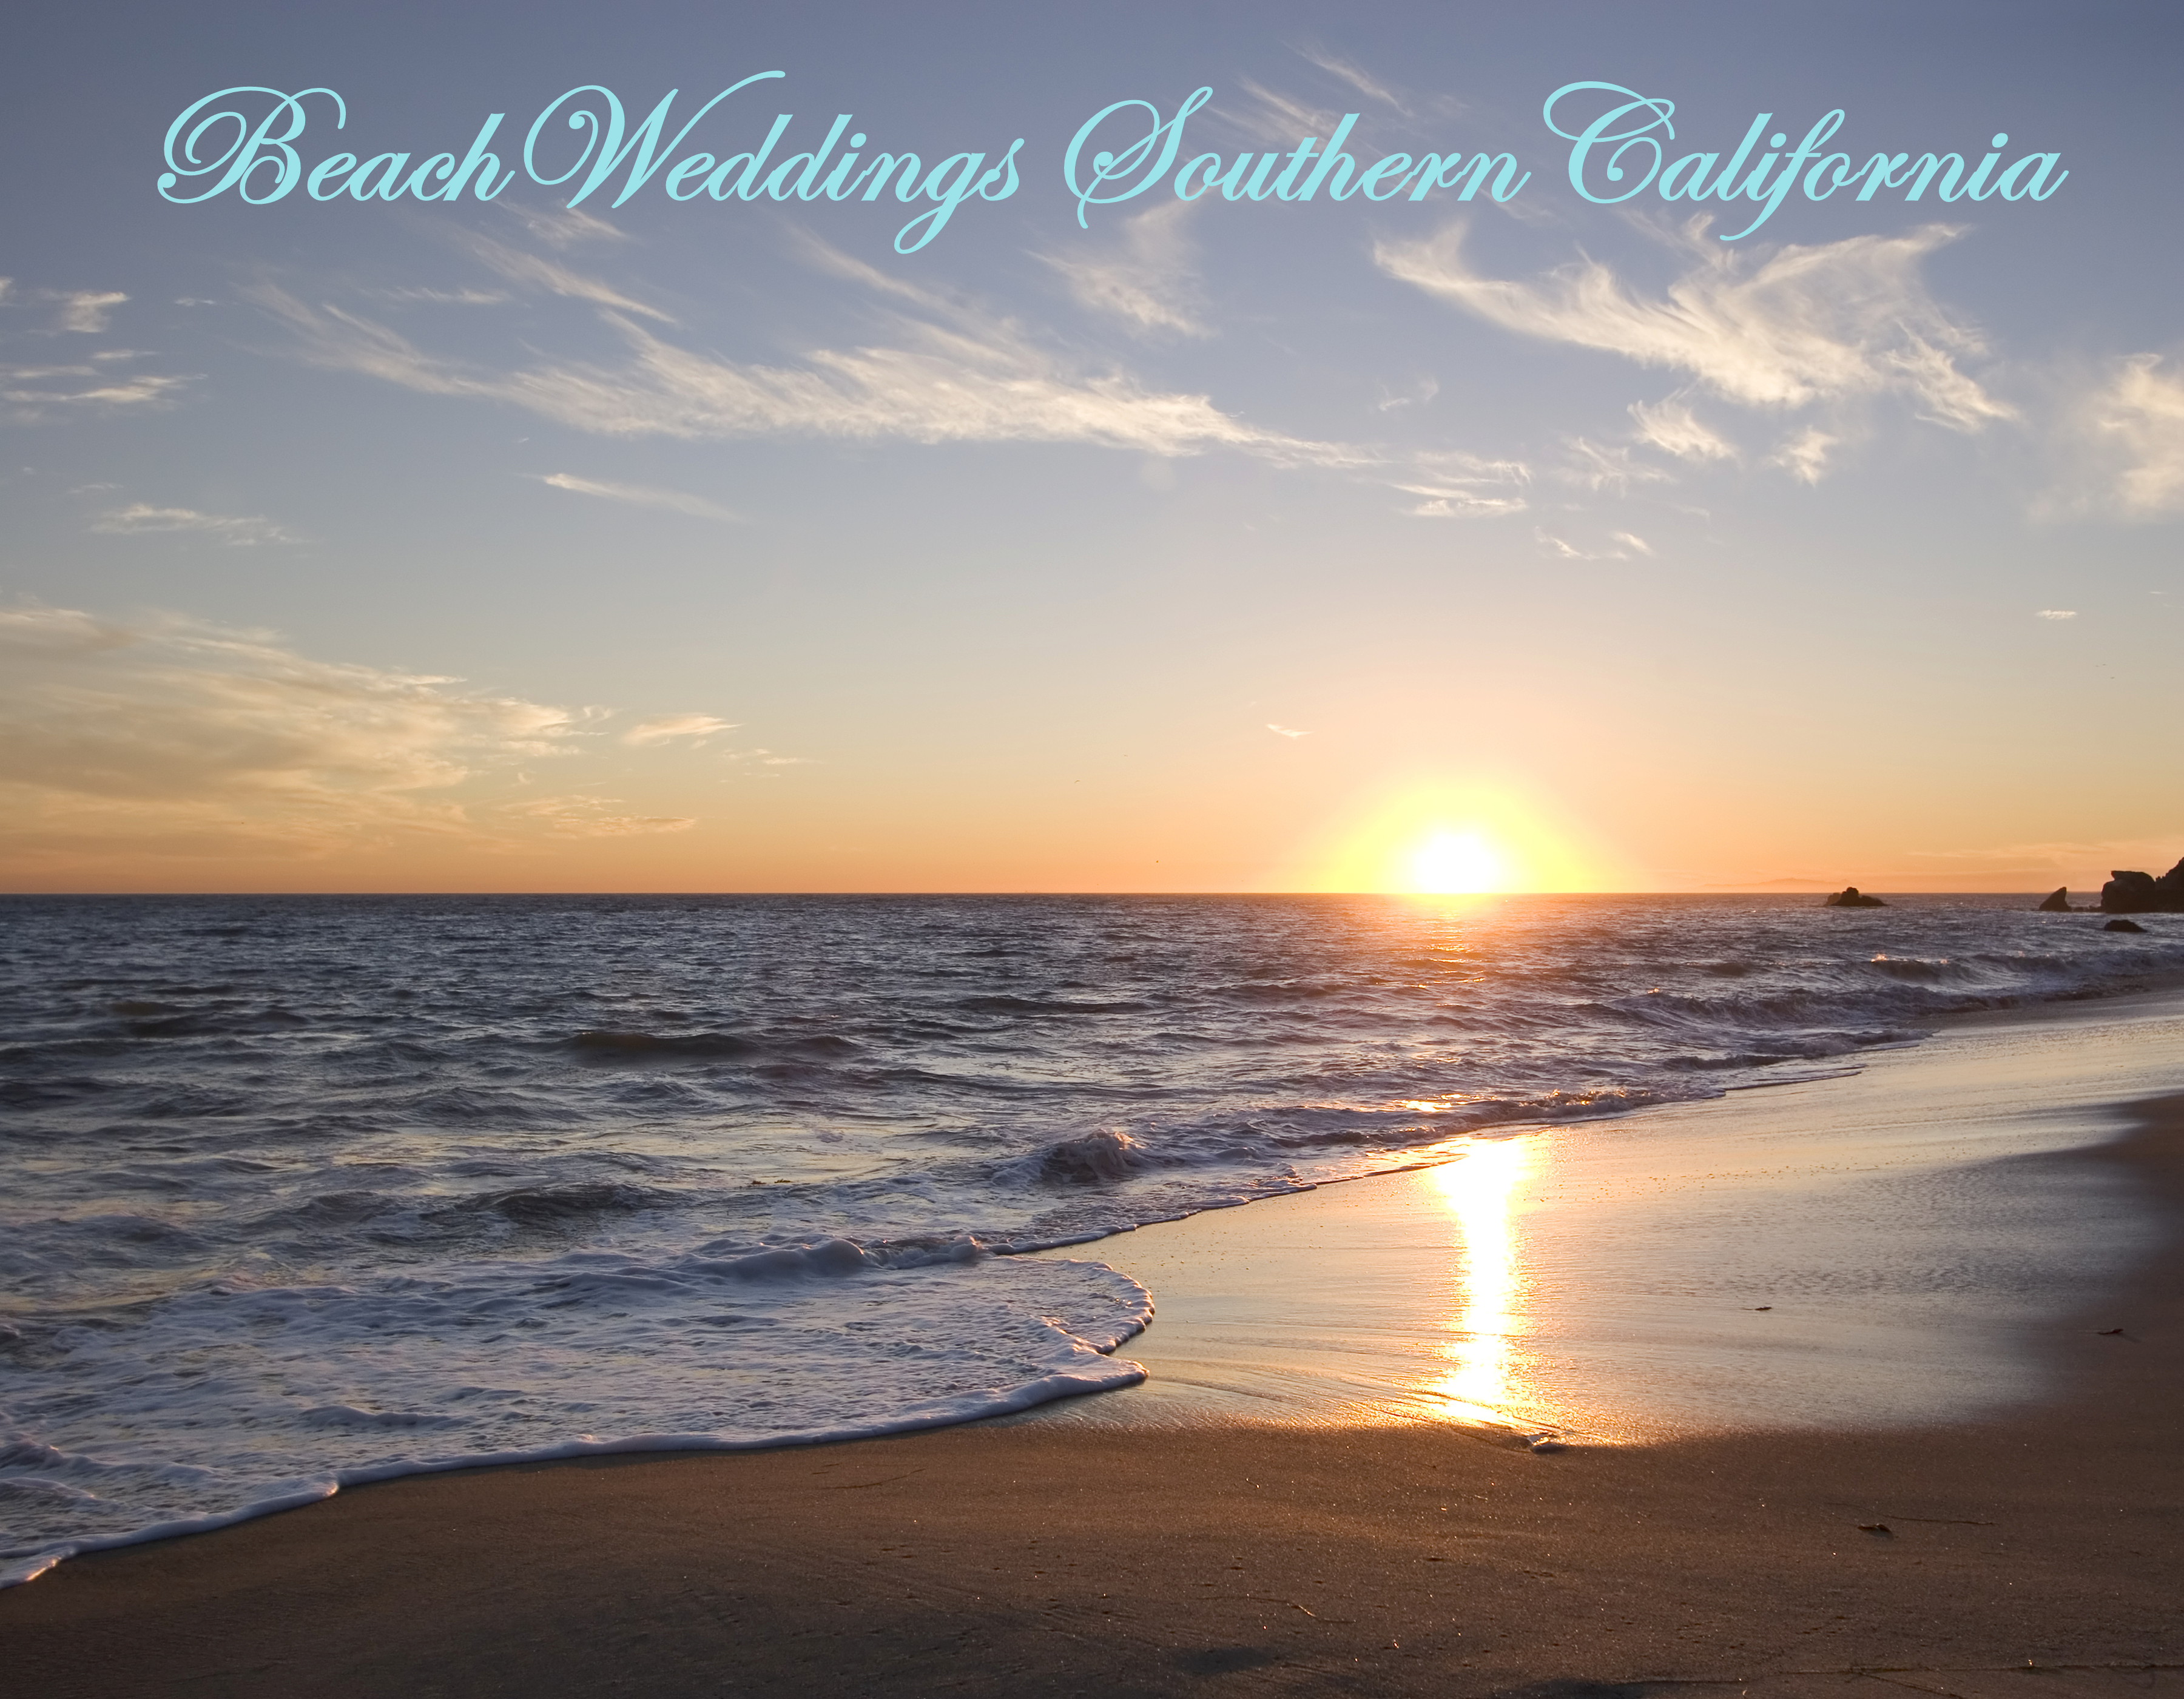 Our New Sister Website Beachweddingssoutherncalifornia